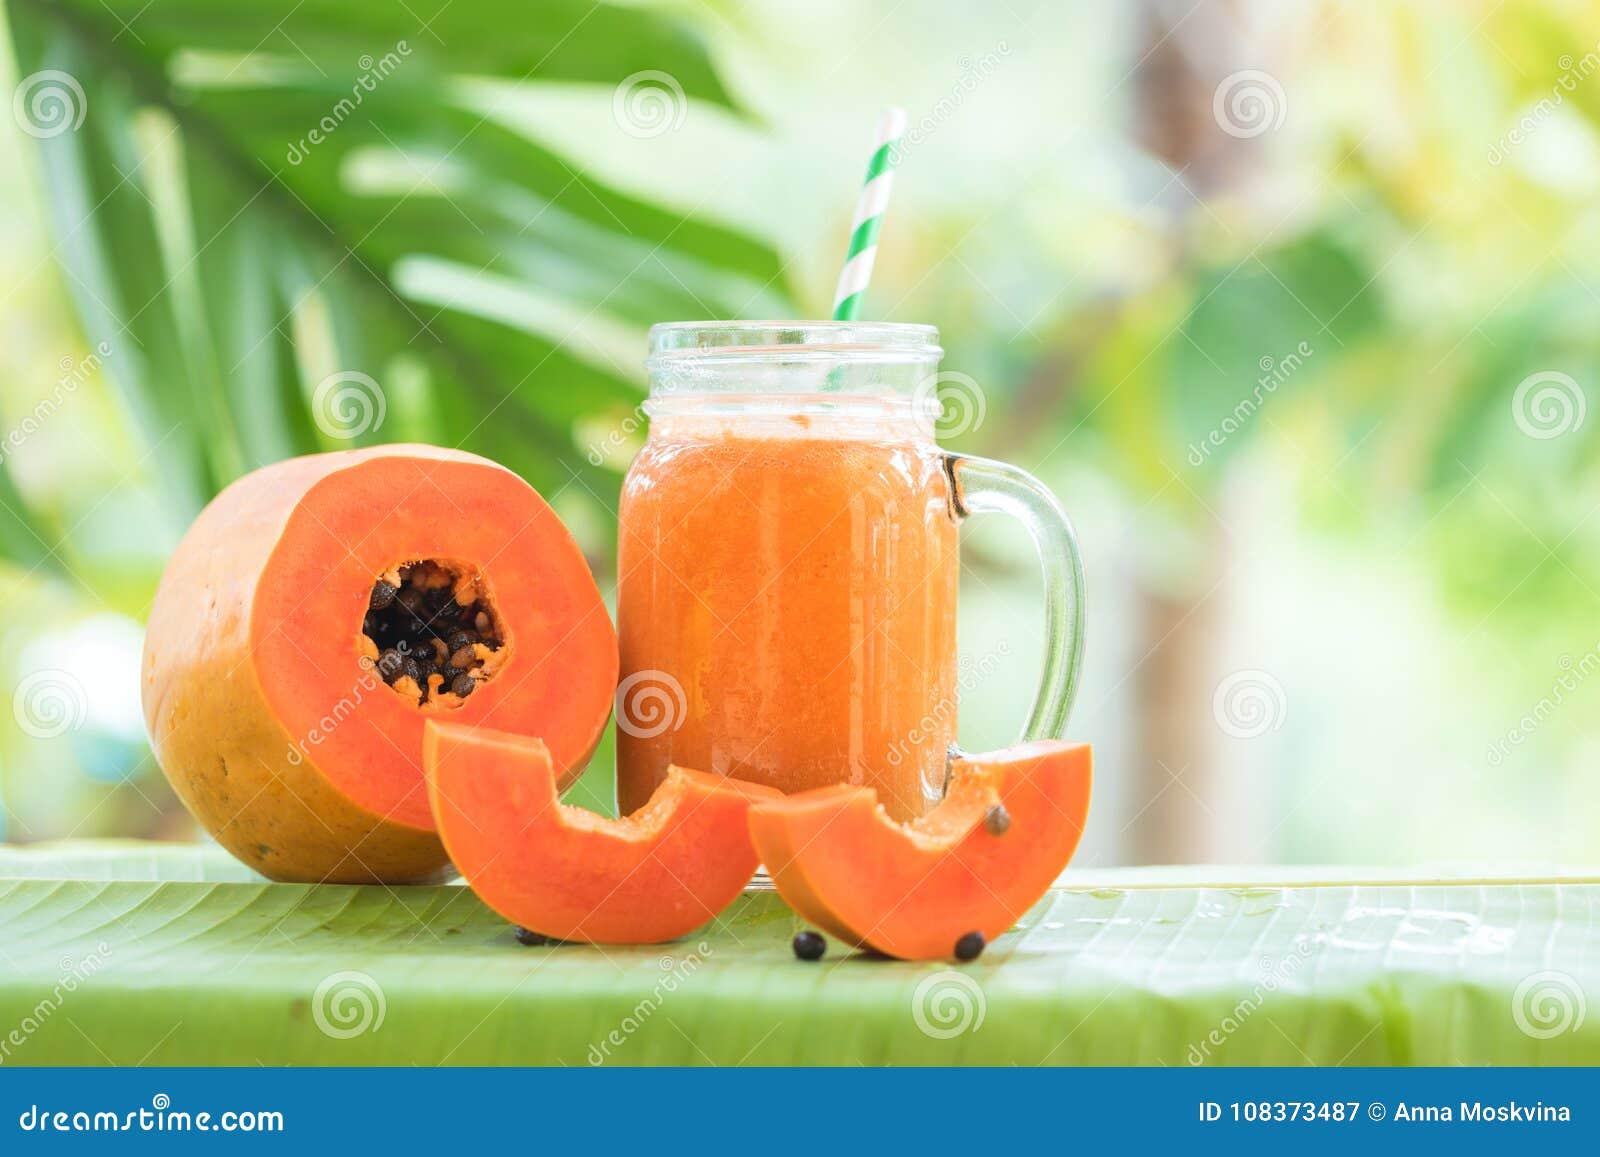 Papaya Fruit Glass Jar With Smoothie Shake Stock Image - Image of